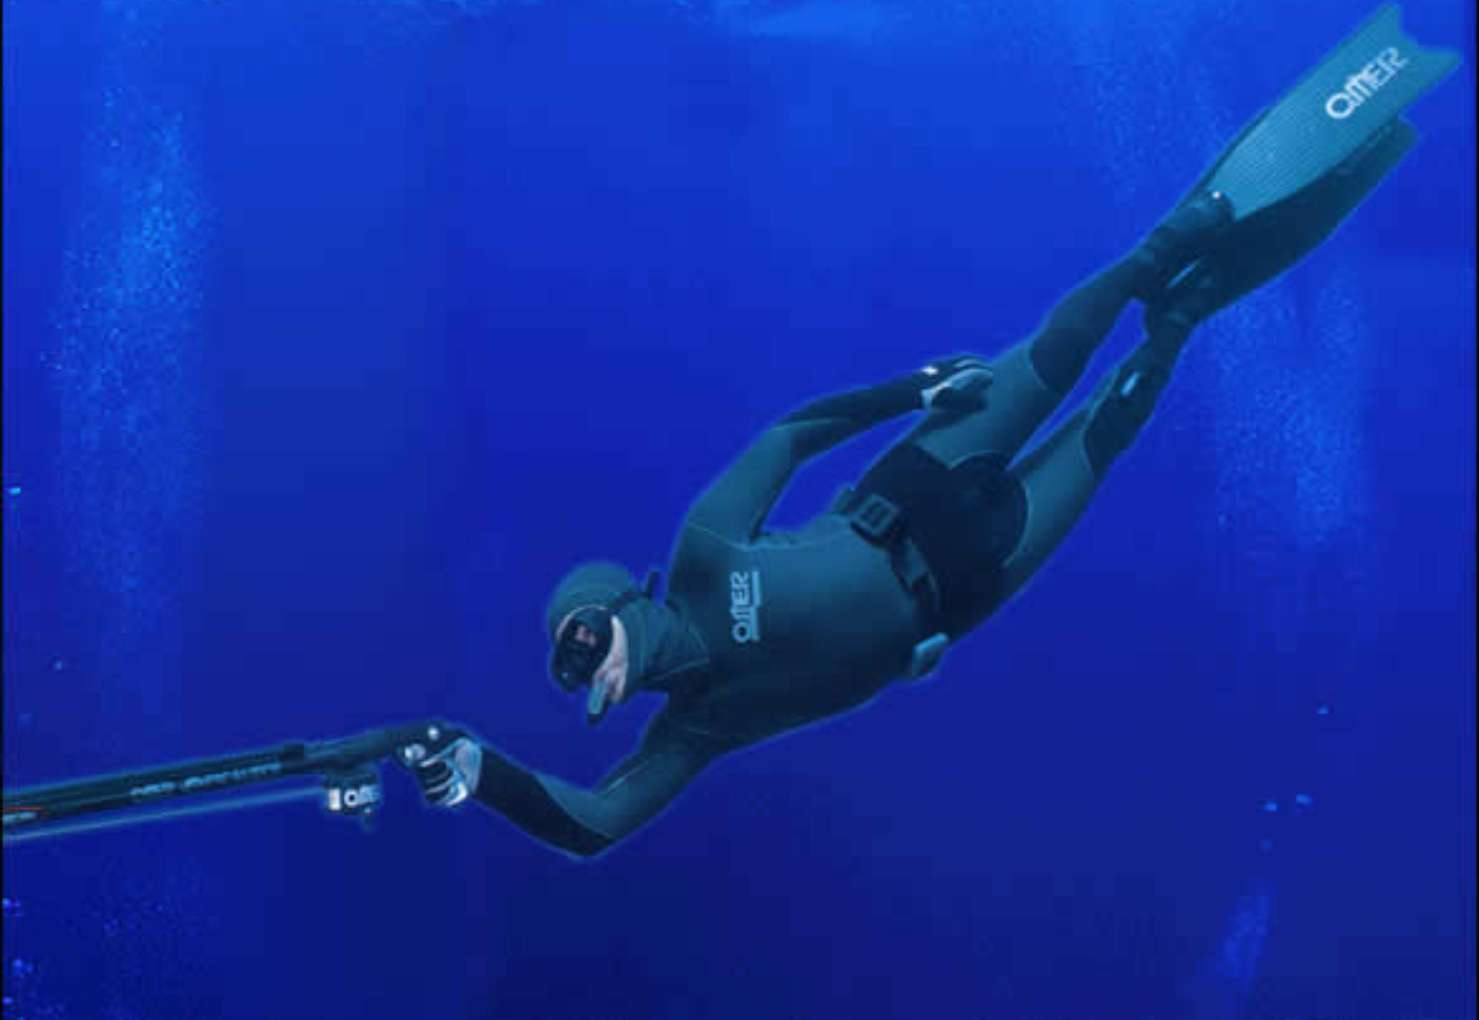 Resultado de imagen para pesca submarina